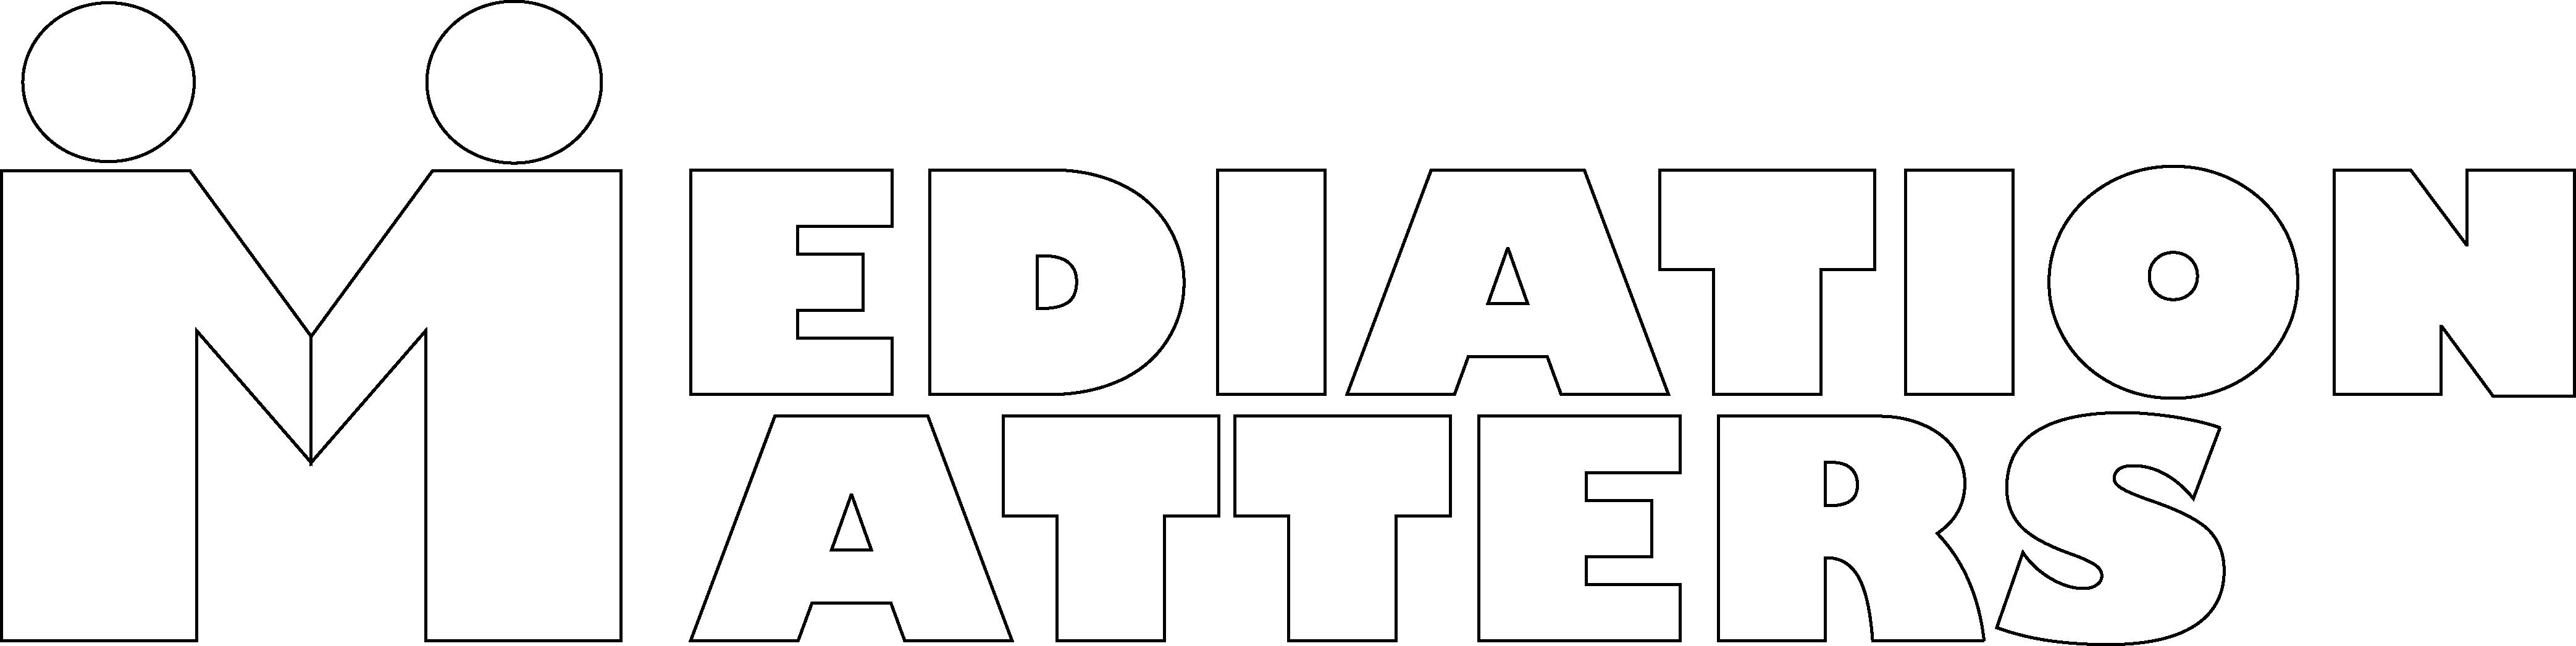 Word Logo Template